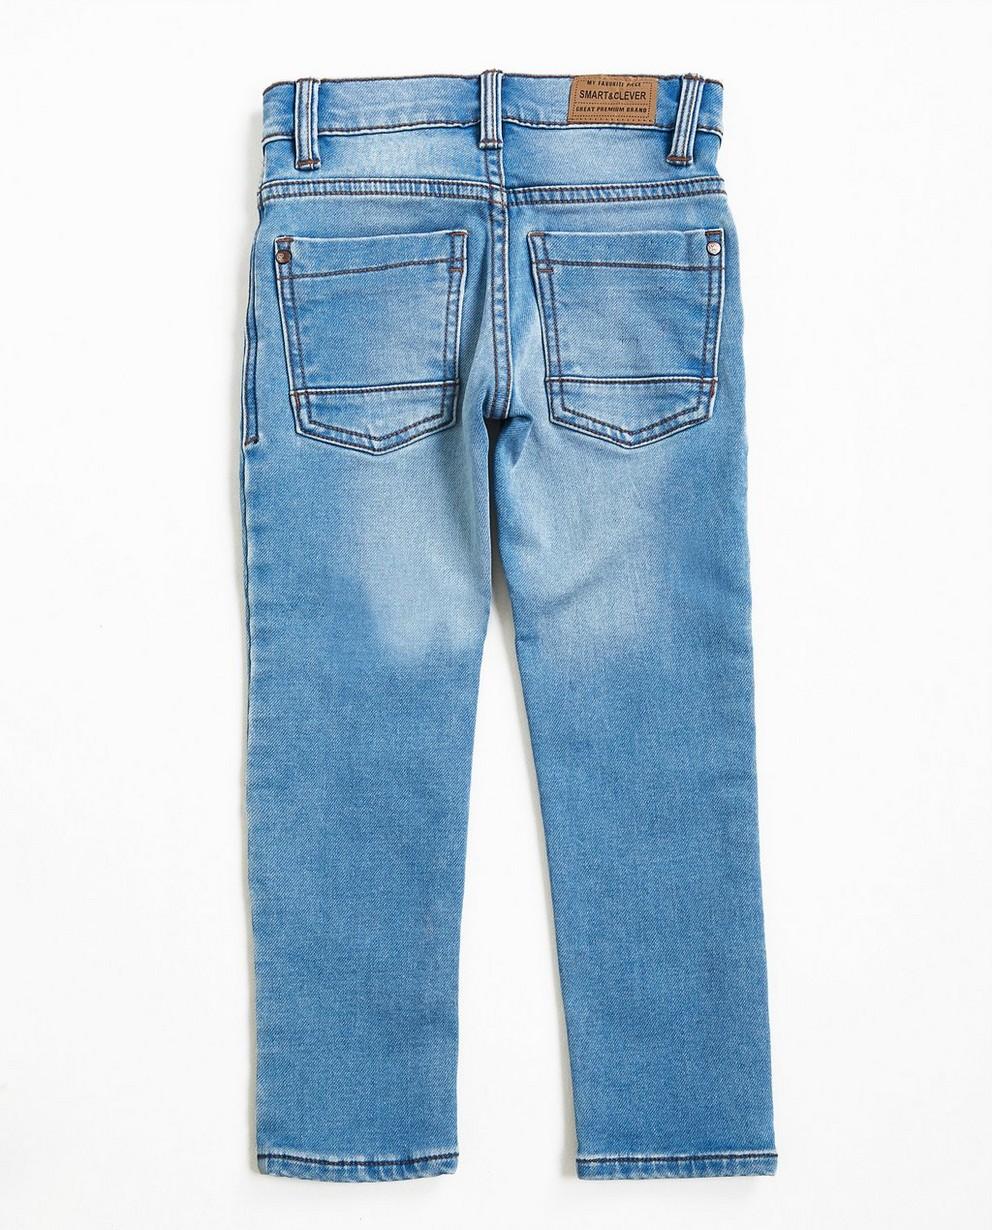 Jeans - light turquise - Jeans slim bleu ciel, sweat denim